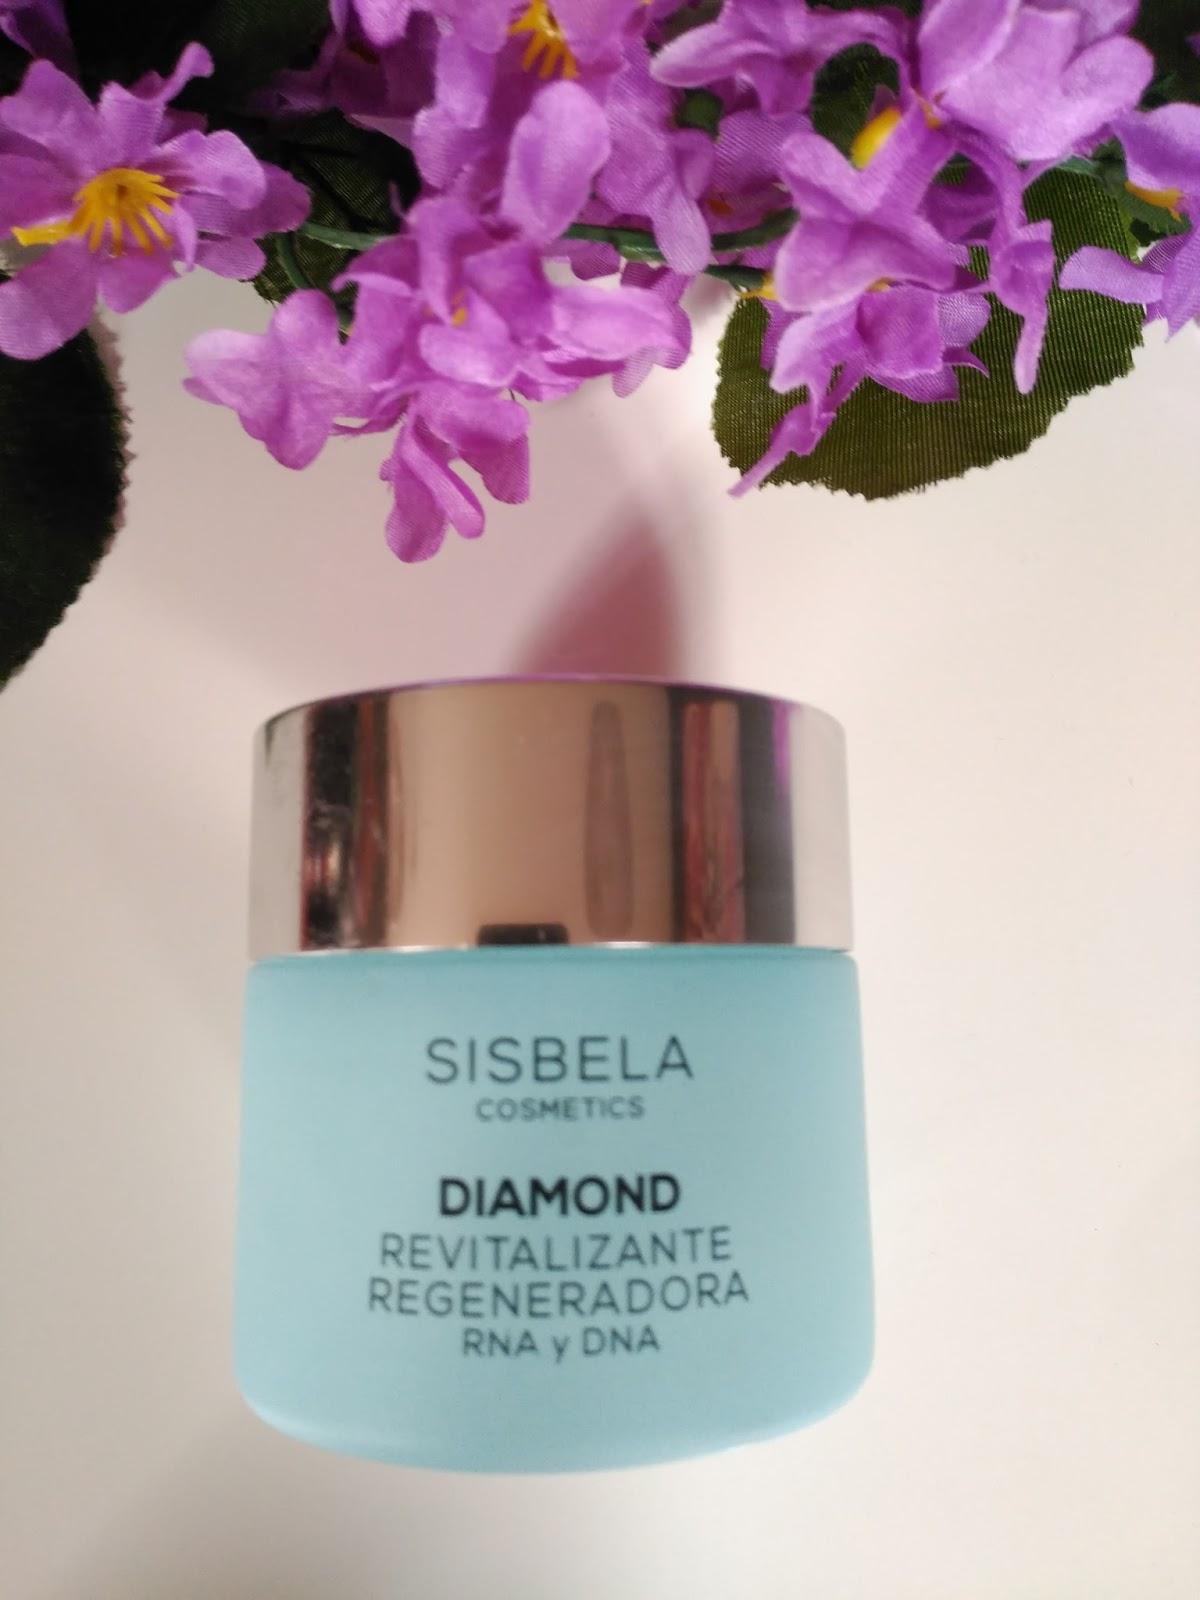 Crema Diamond Sisbela de Mercadona